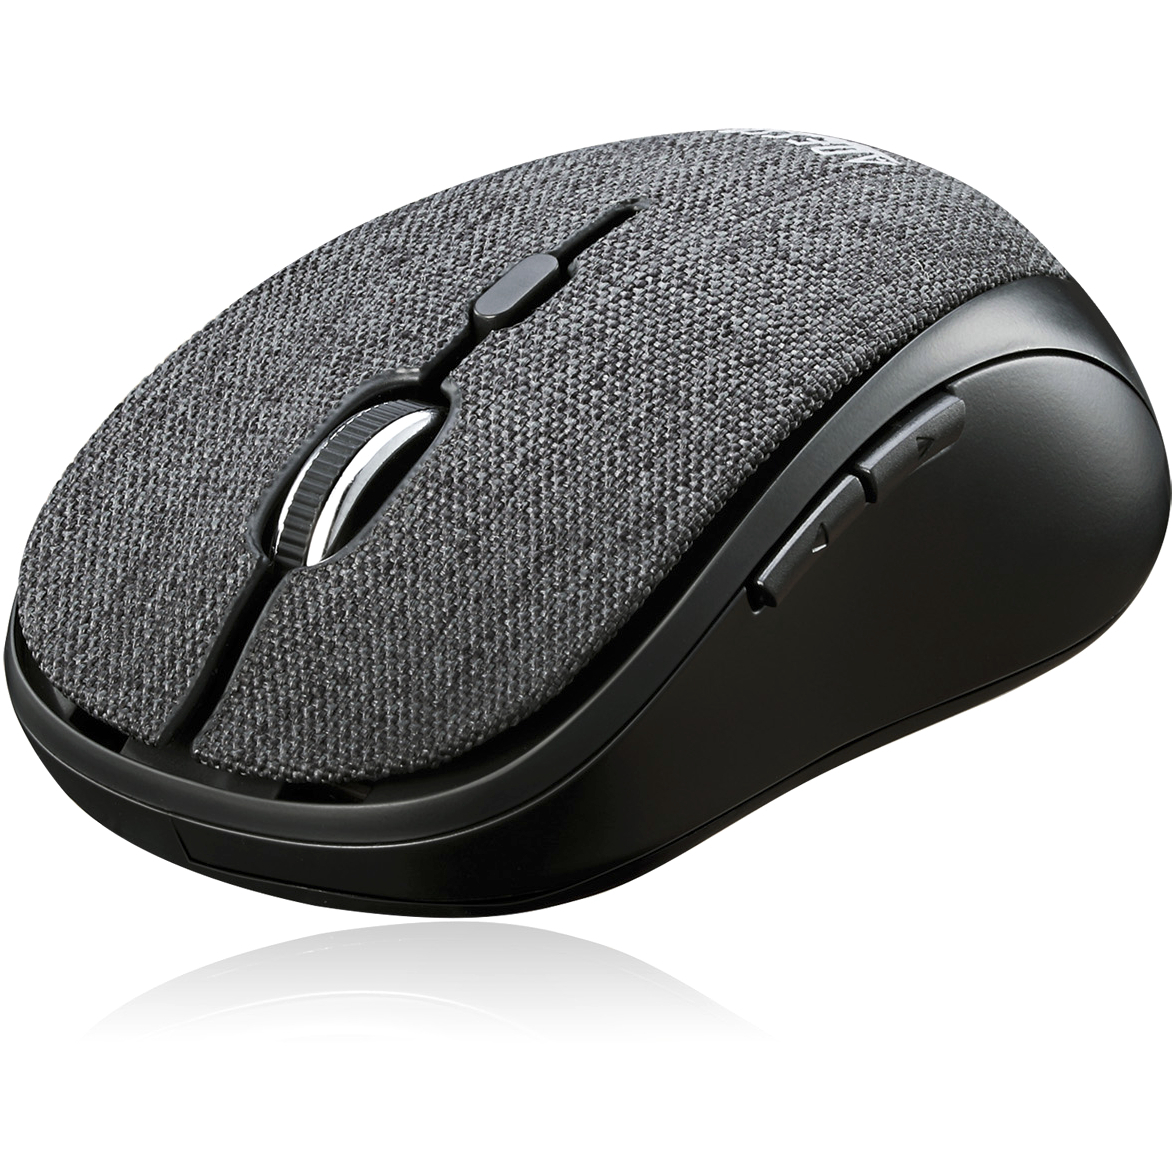 Adesso IMouse S80B   Wireless Fabric Optical Mini Mouse (Black) Alternate-Image8